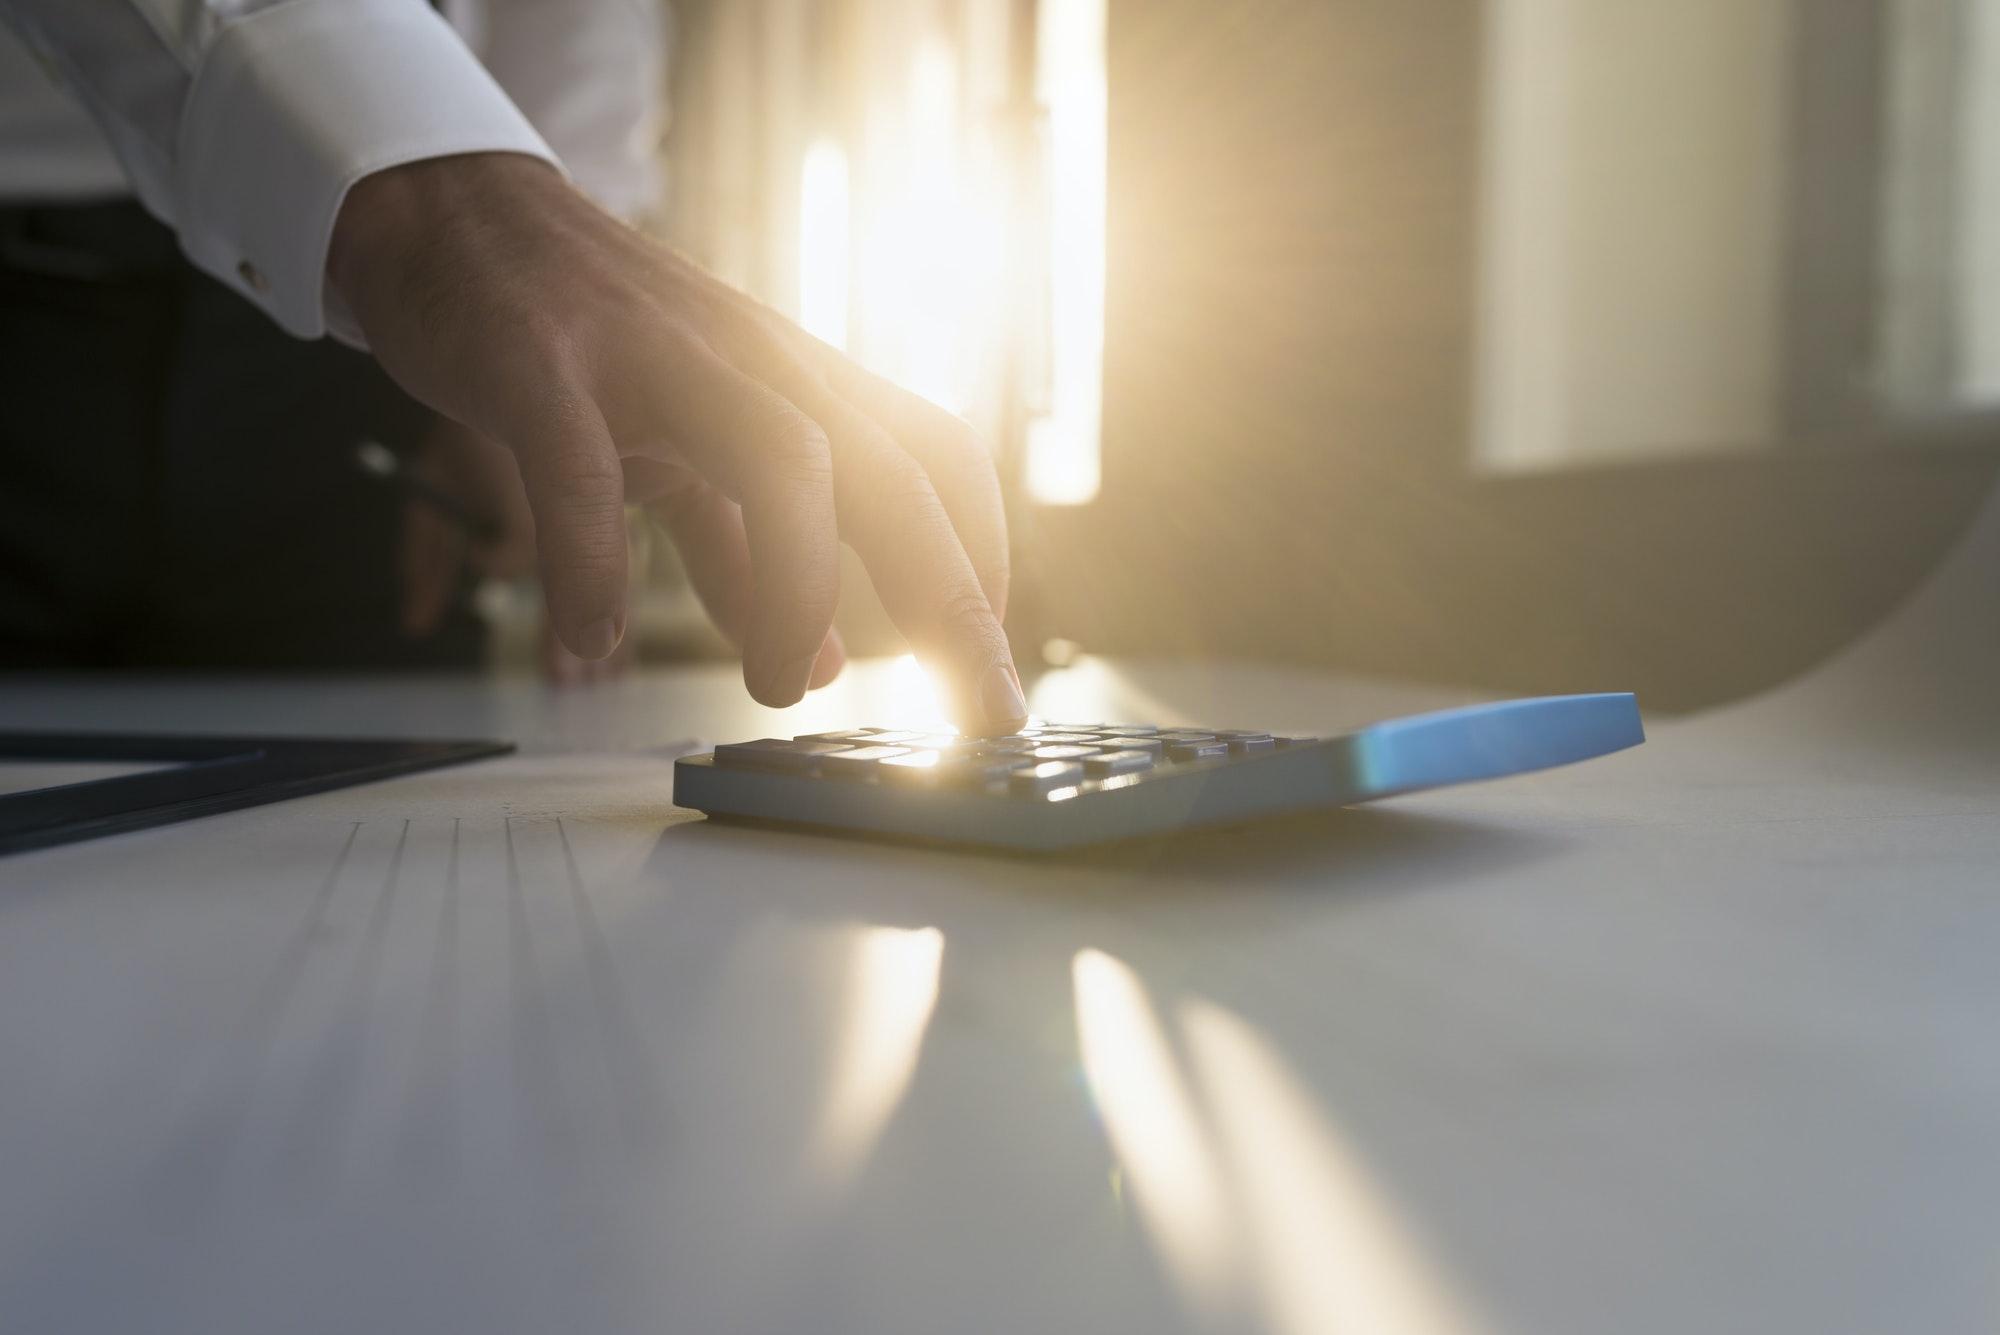 Hand of a businessman using a desk calculator